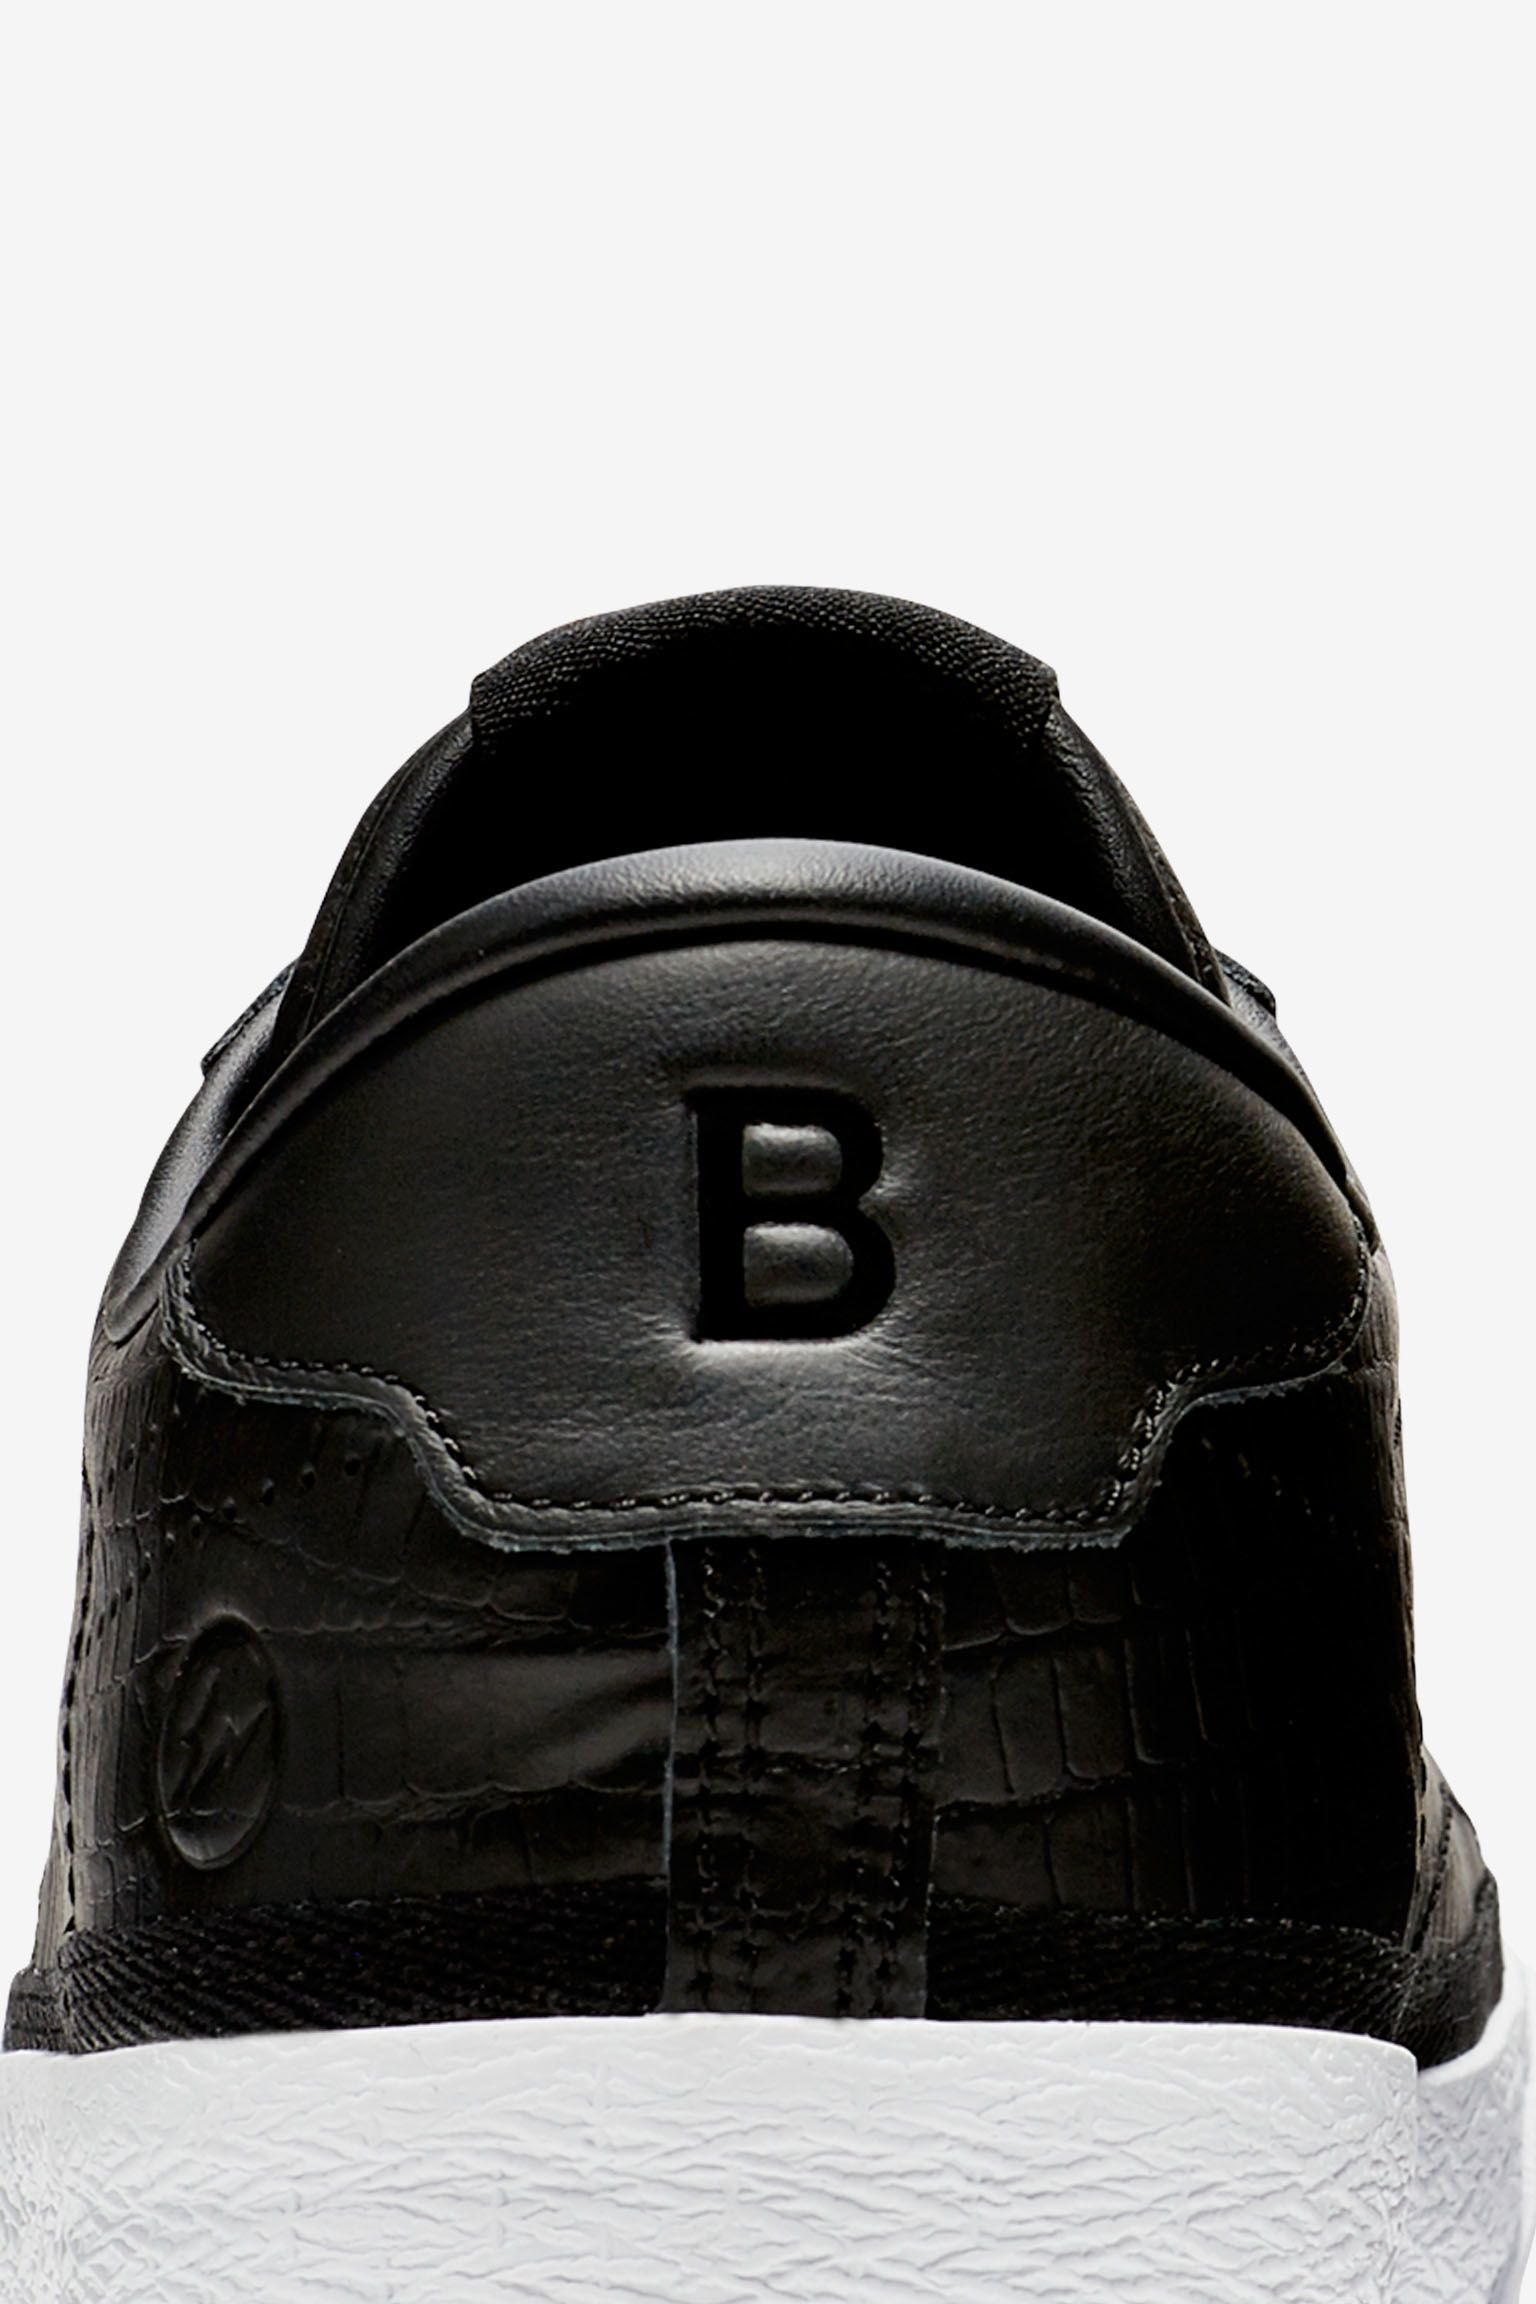 Nike Zoom Tennis Classic x fragment 'Black'